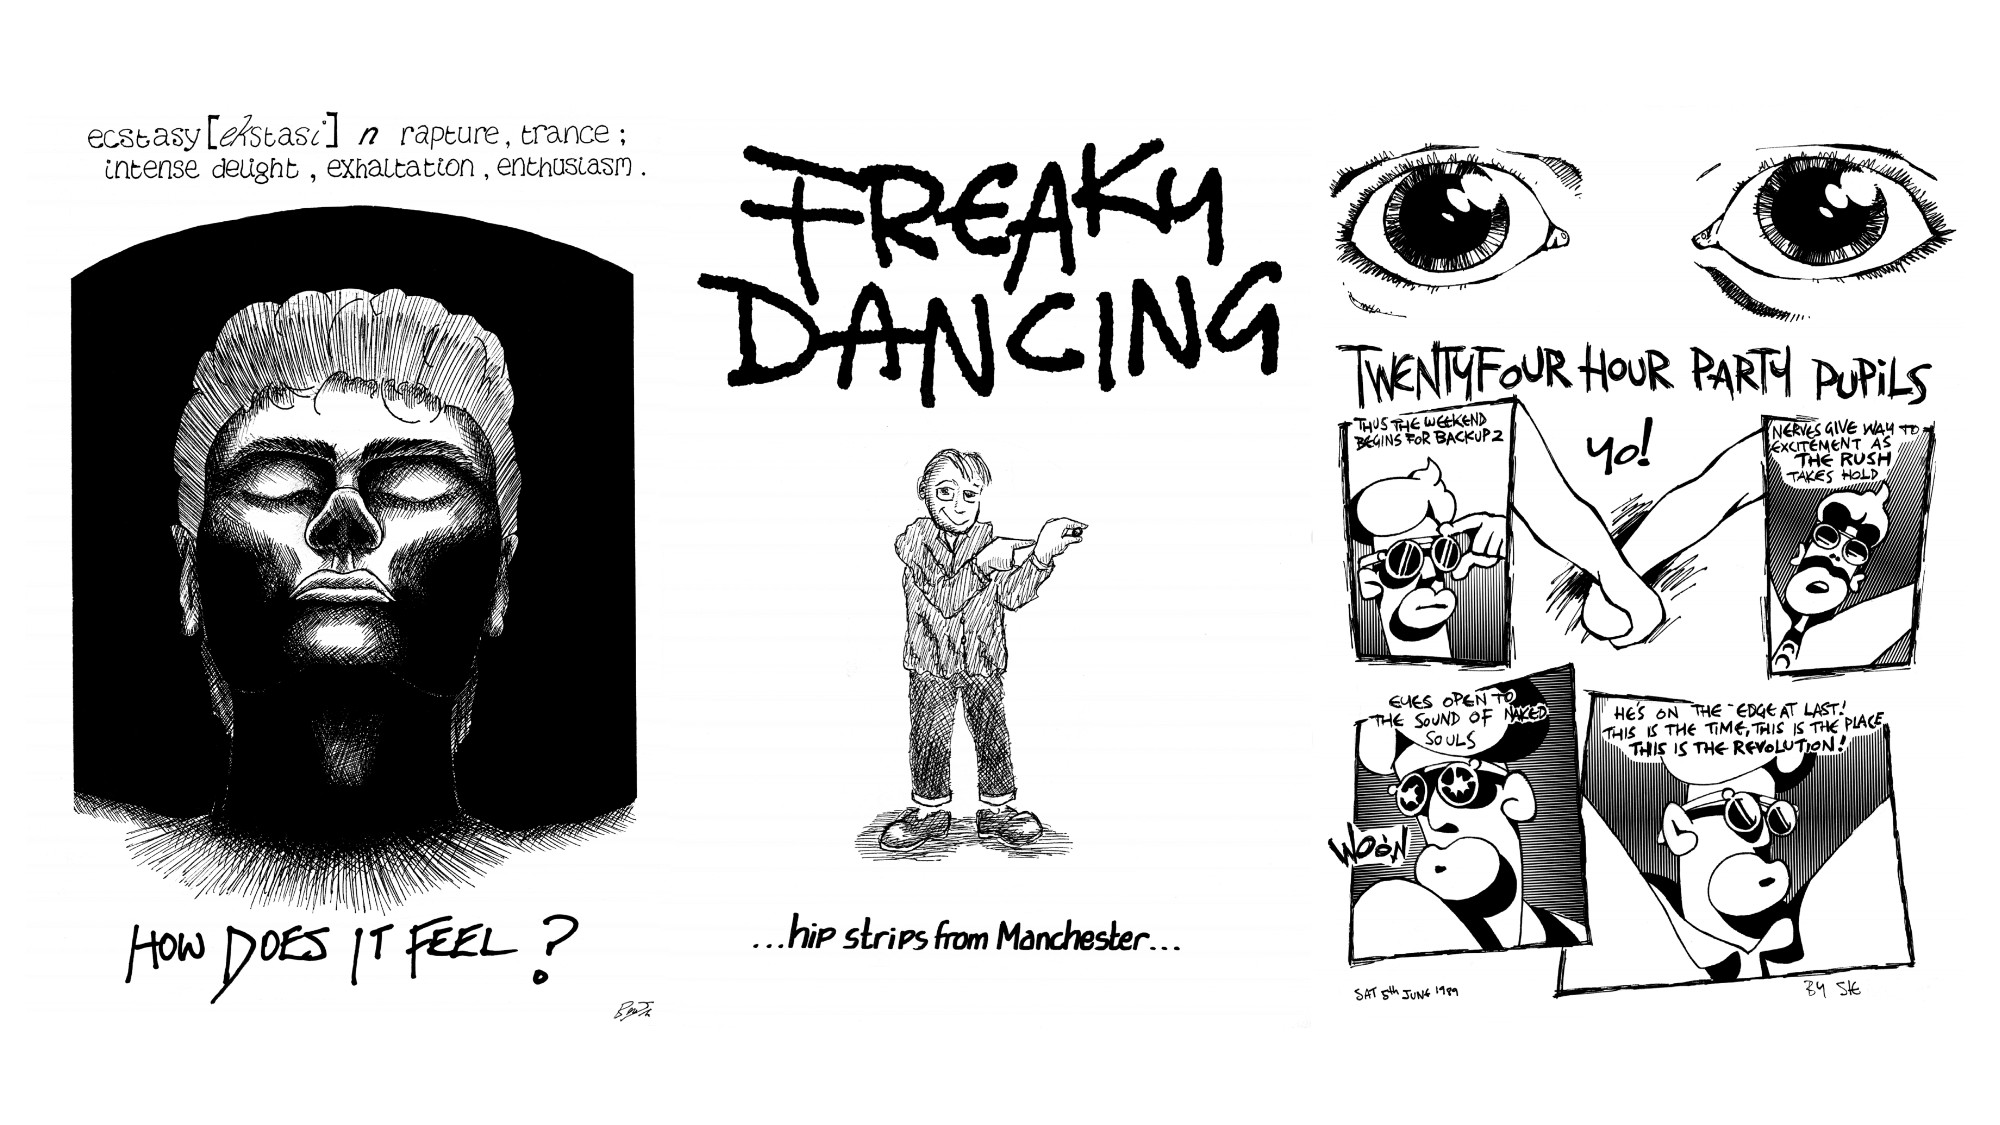 Freaky Dancing' Was the Original Acid House Fanzine - VICE